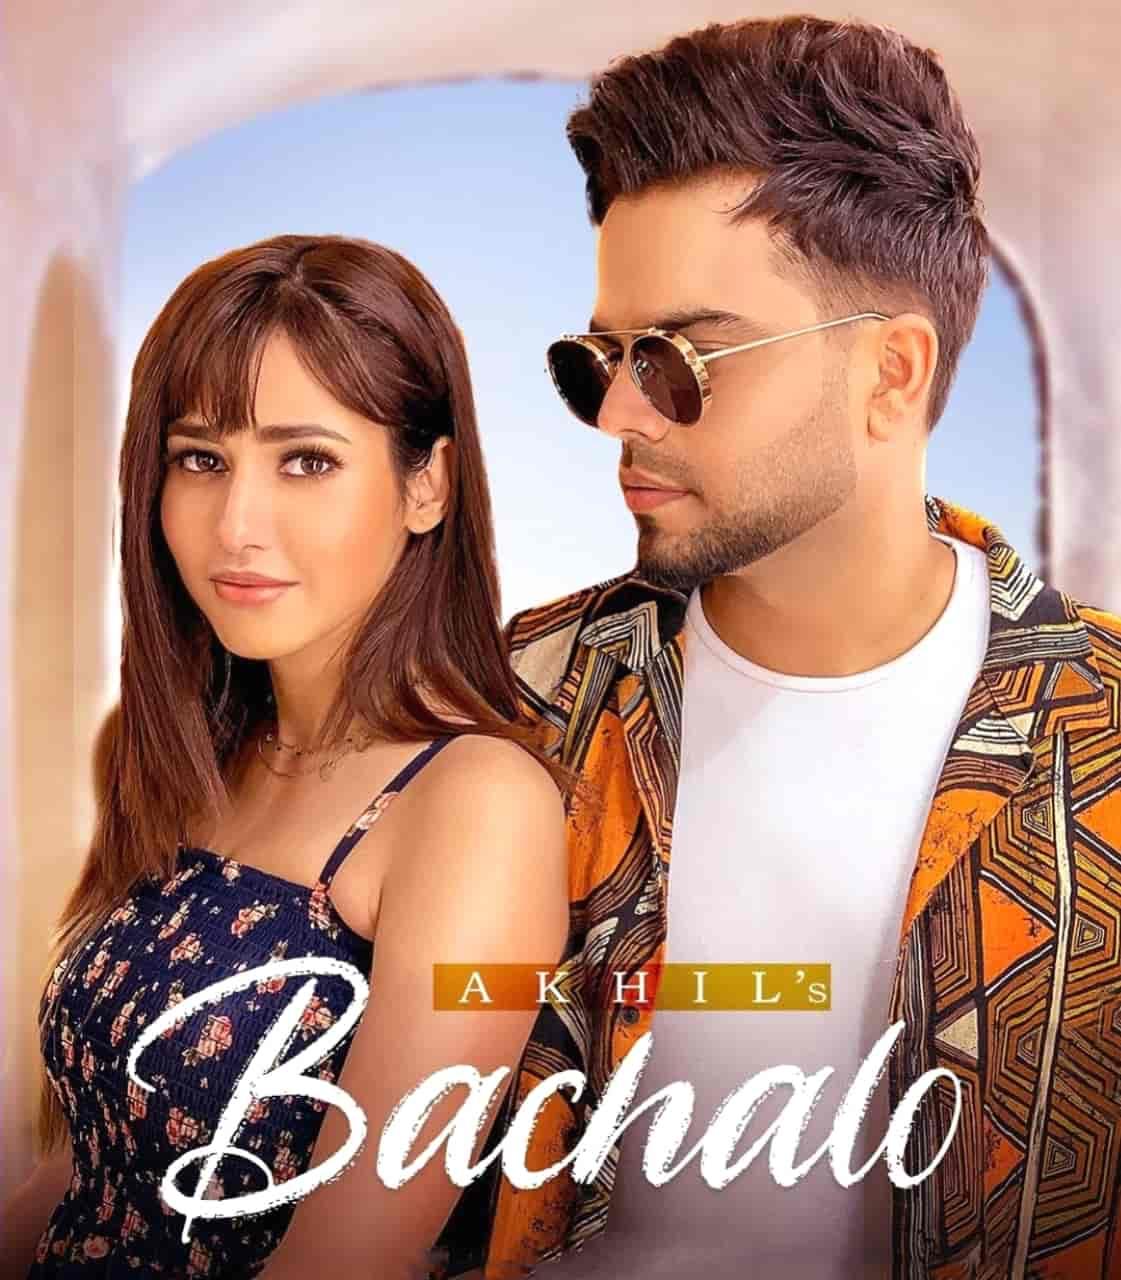 Bachalo Punjabi Song Image Features Akhil and Rumman Shahrukh